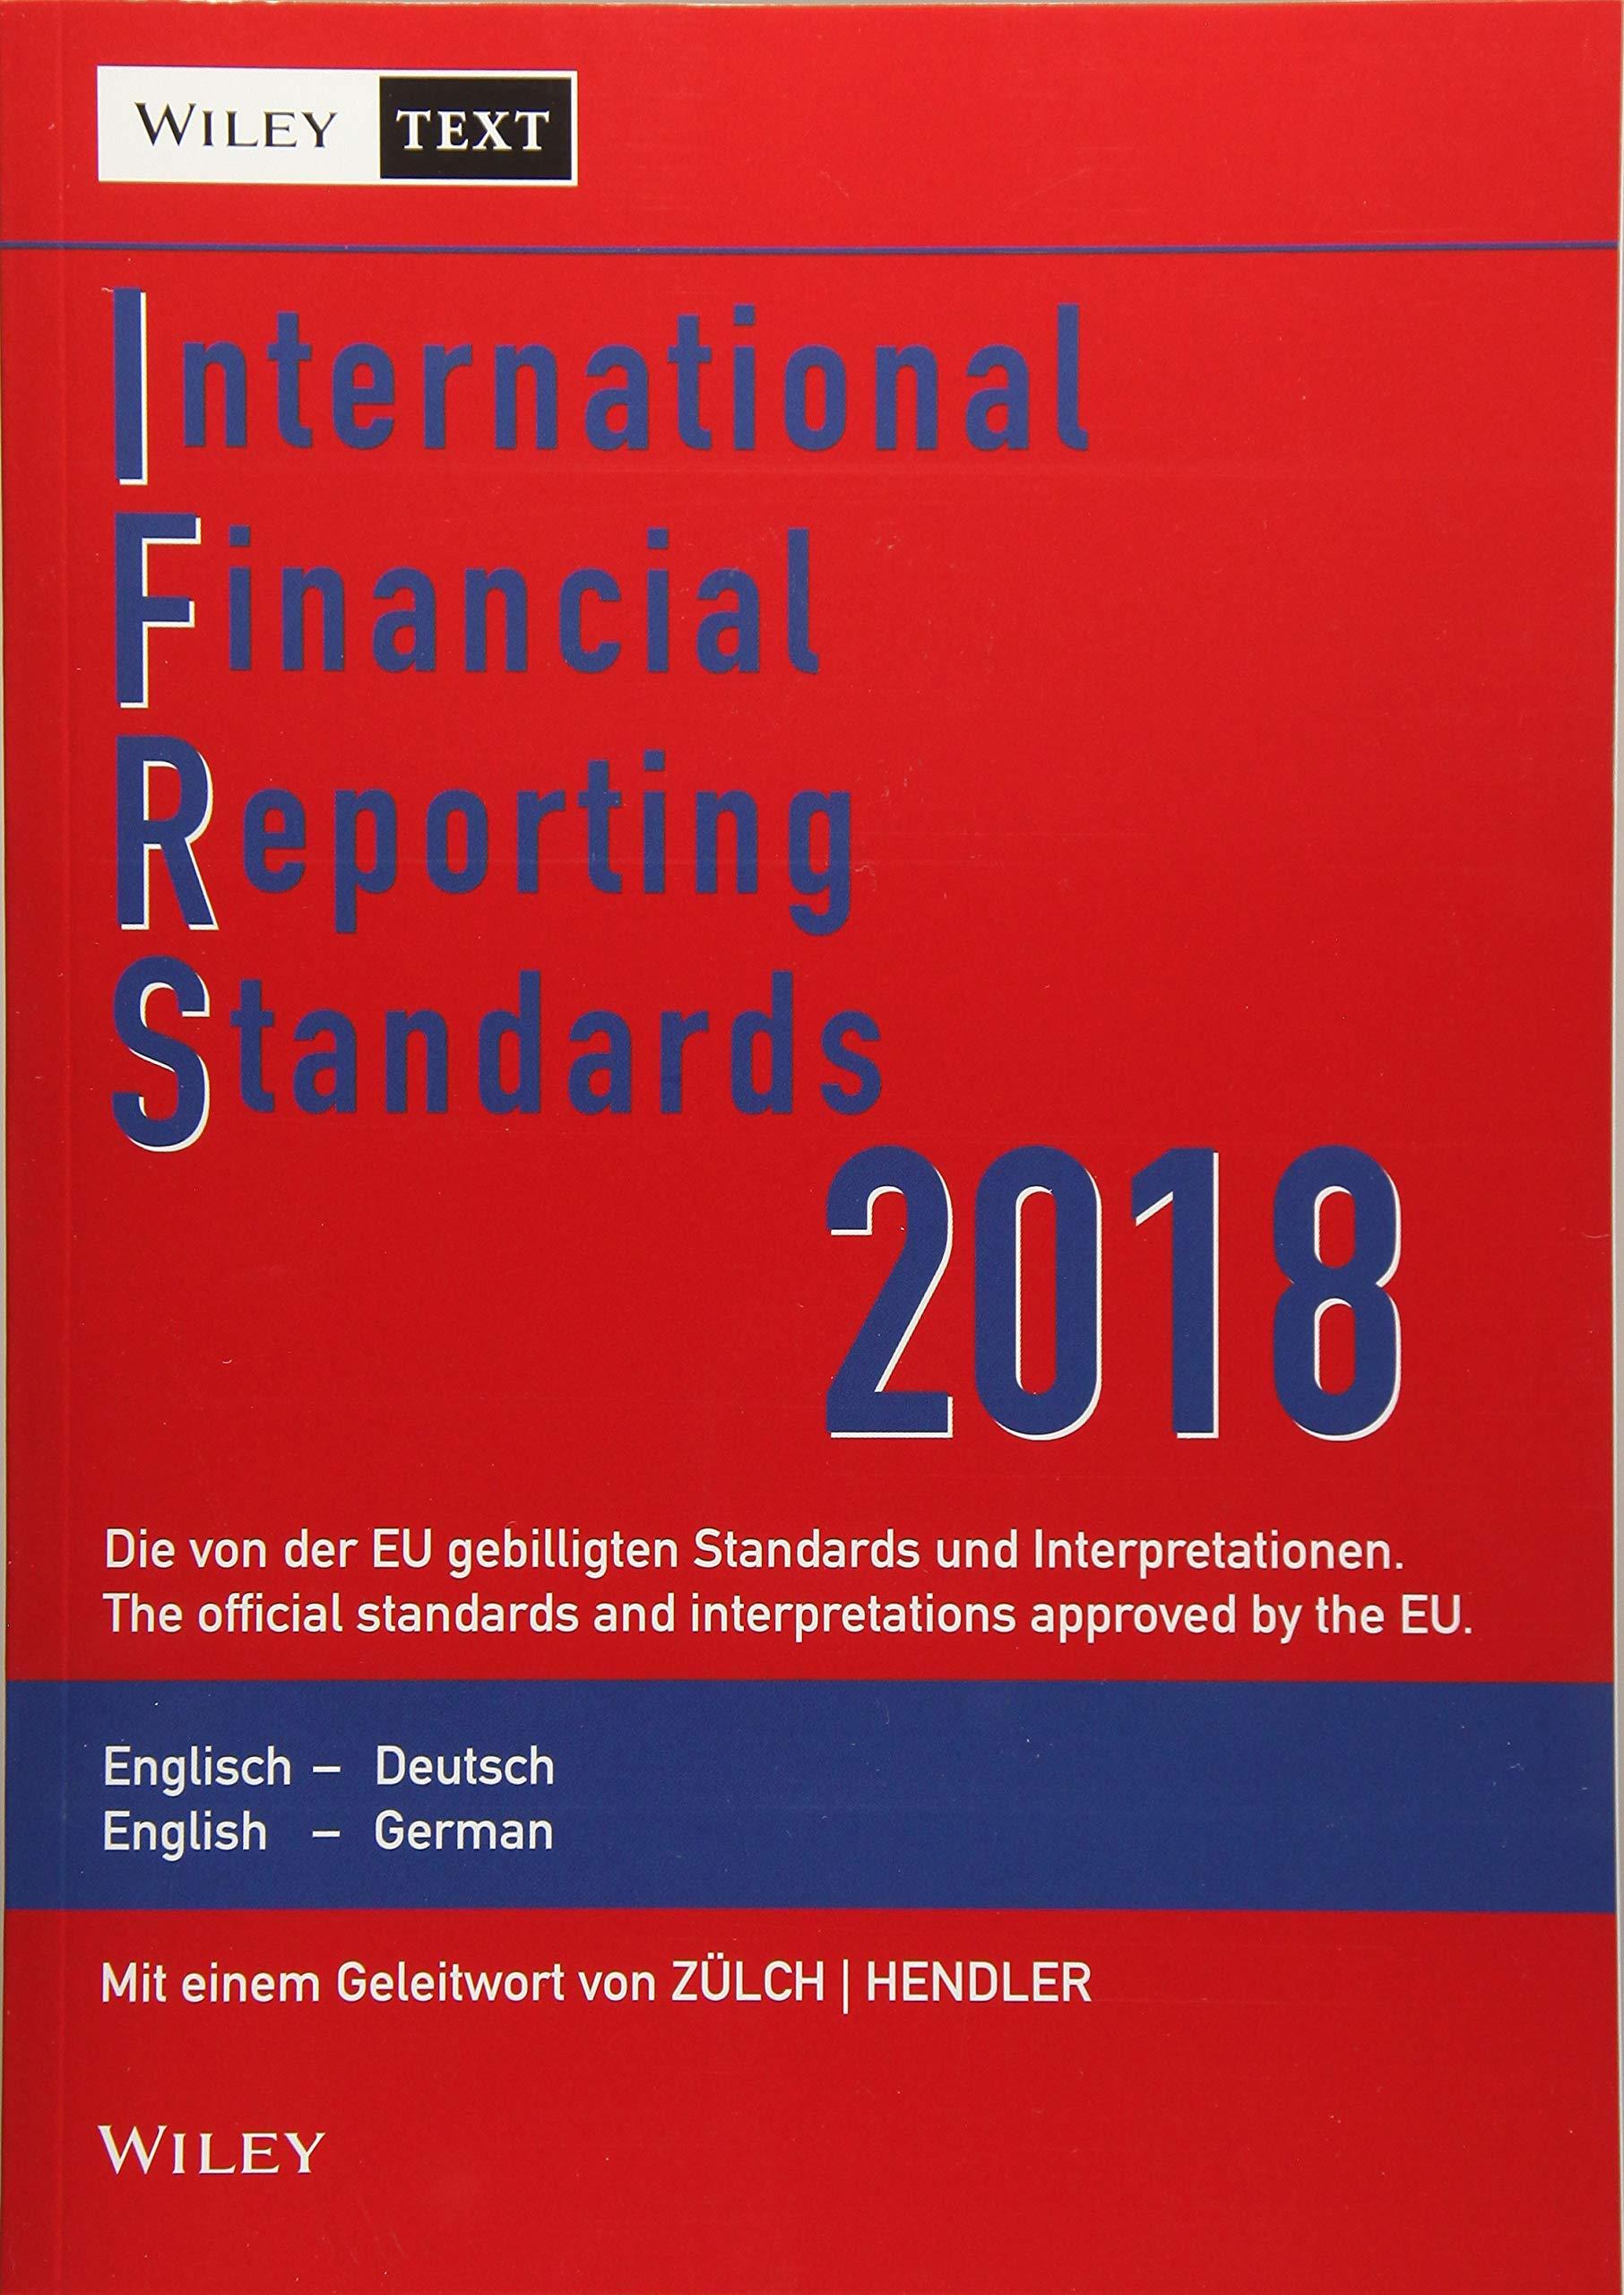 International Financial Reporting Standards (IFRS) 2018: Deutsch-Englische Textausgabe der von der EU gebilligten Standards. English & German edition of the official standards approved by the EU